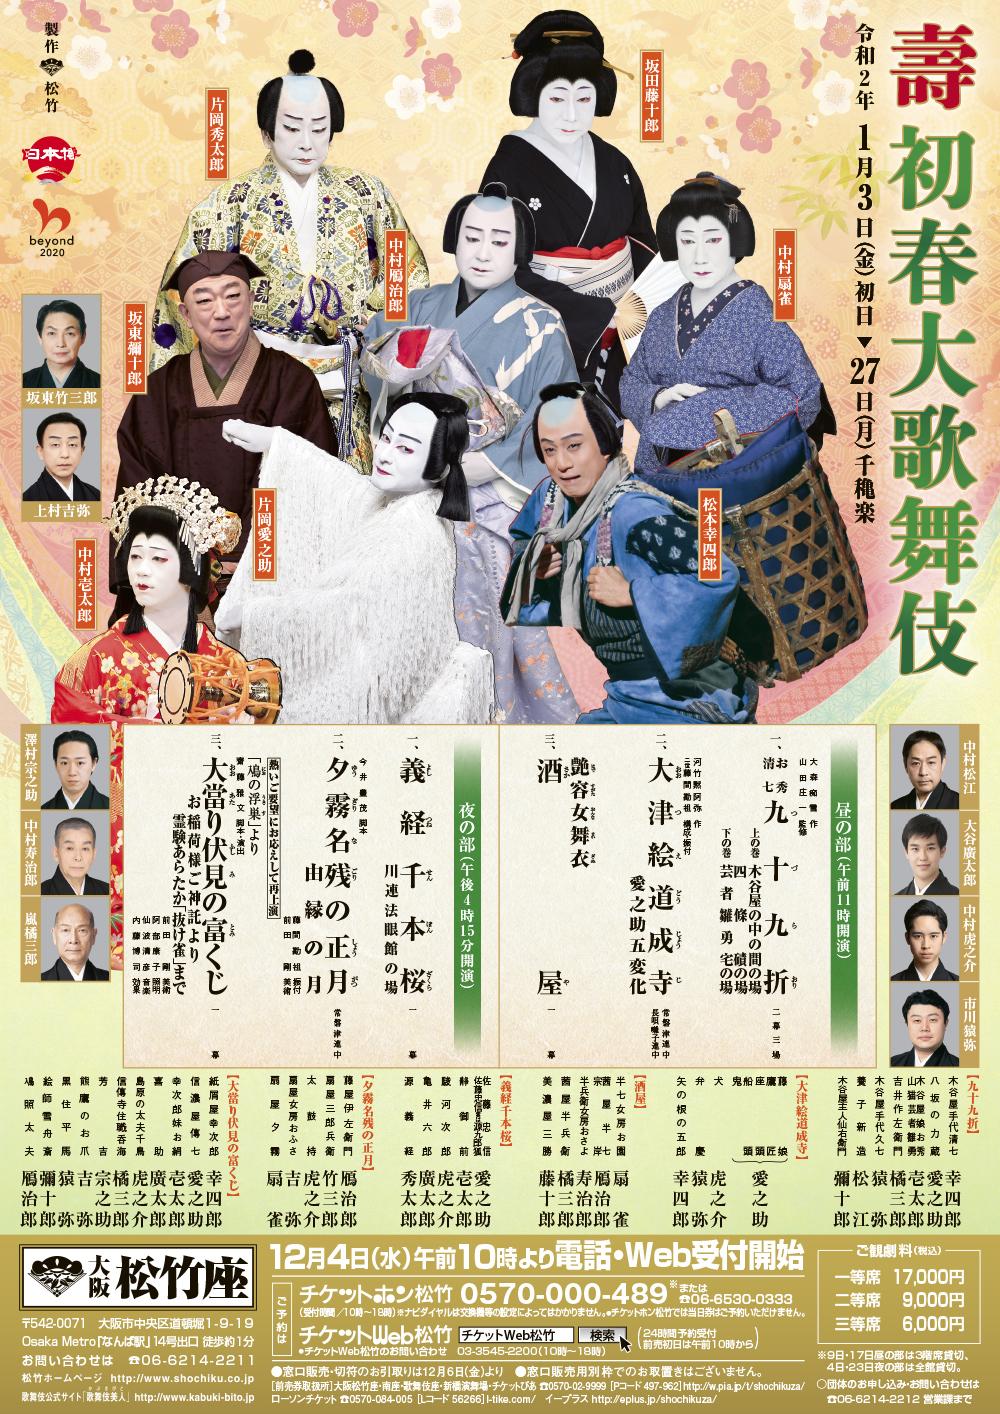 https://www.kabuki-bito.jp/uploads/images/kouen/659/shochikuza_2001_h_6fb7ee7218a818252fc1b538f58d29e9.jpg